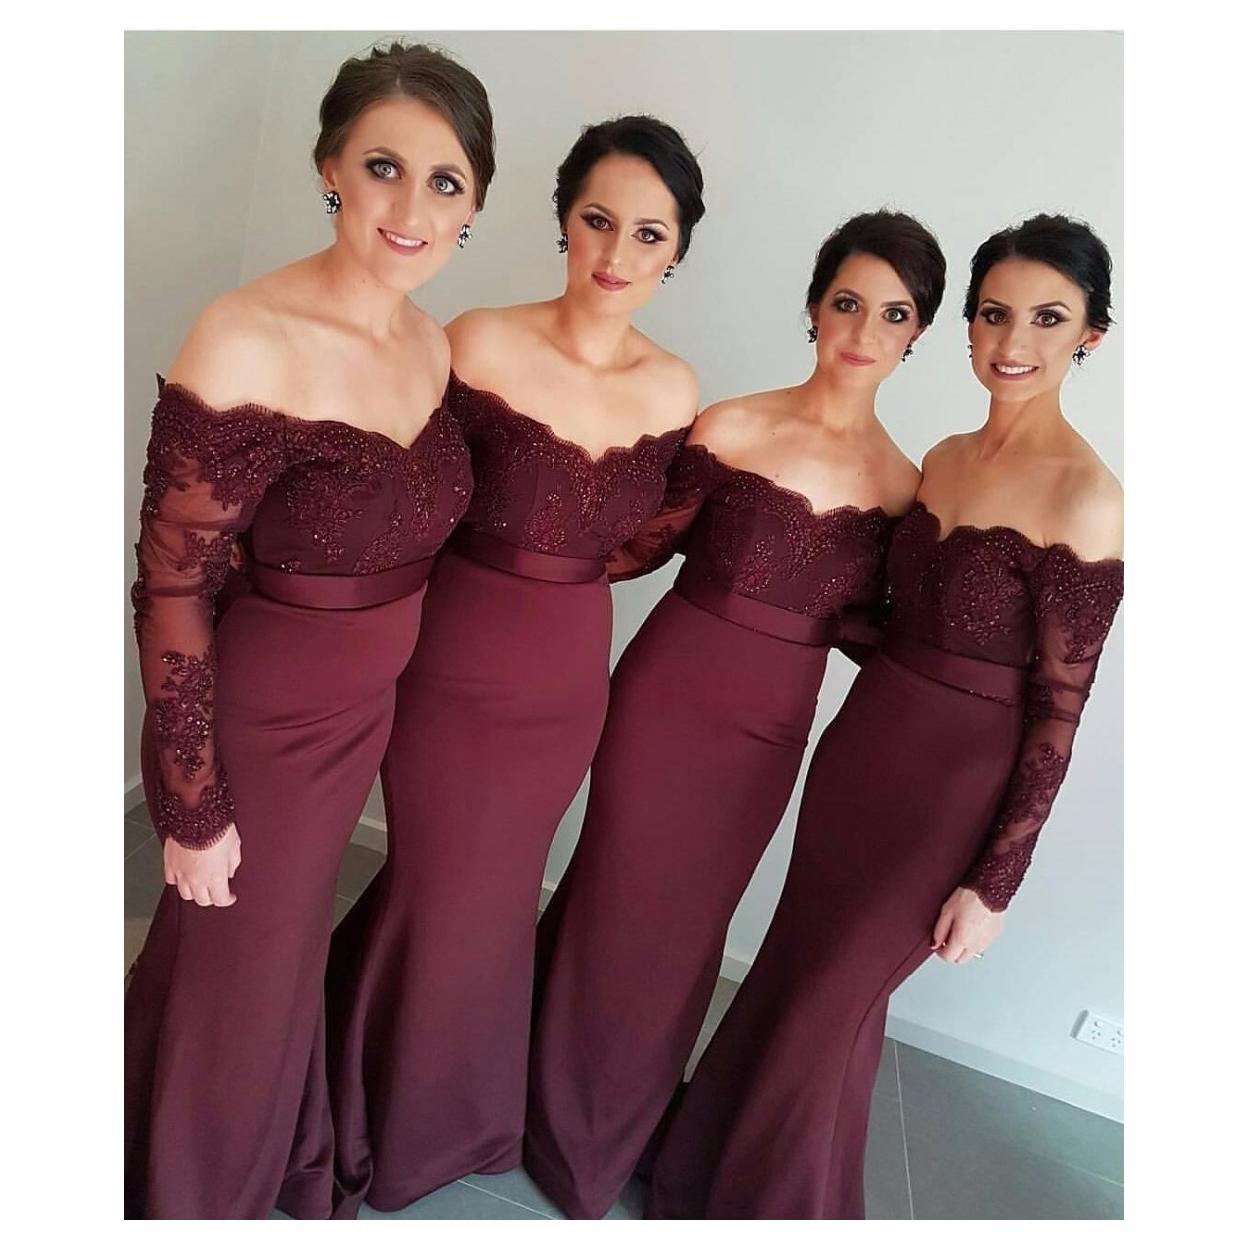 6b867deff03 Burgundy Off Shoulder Long Sleeve Lace Bodice Mermaid Bridesmaid Dress